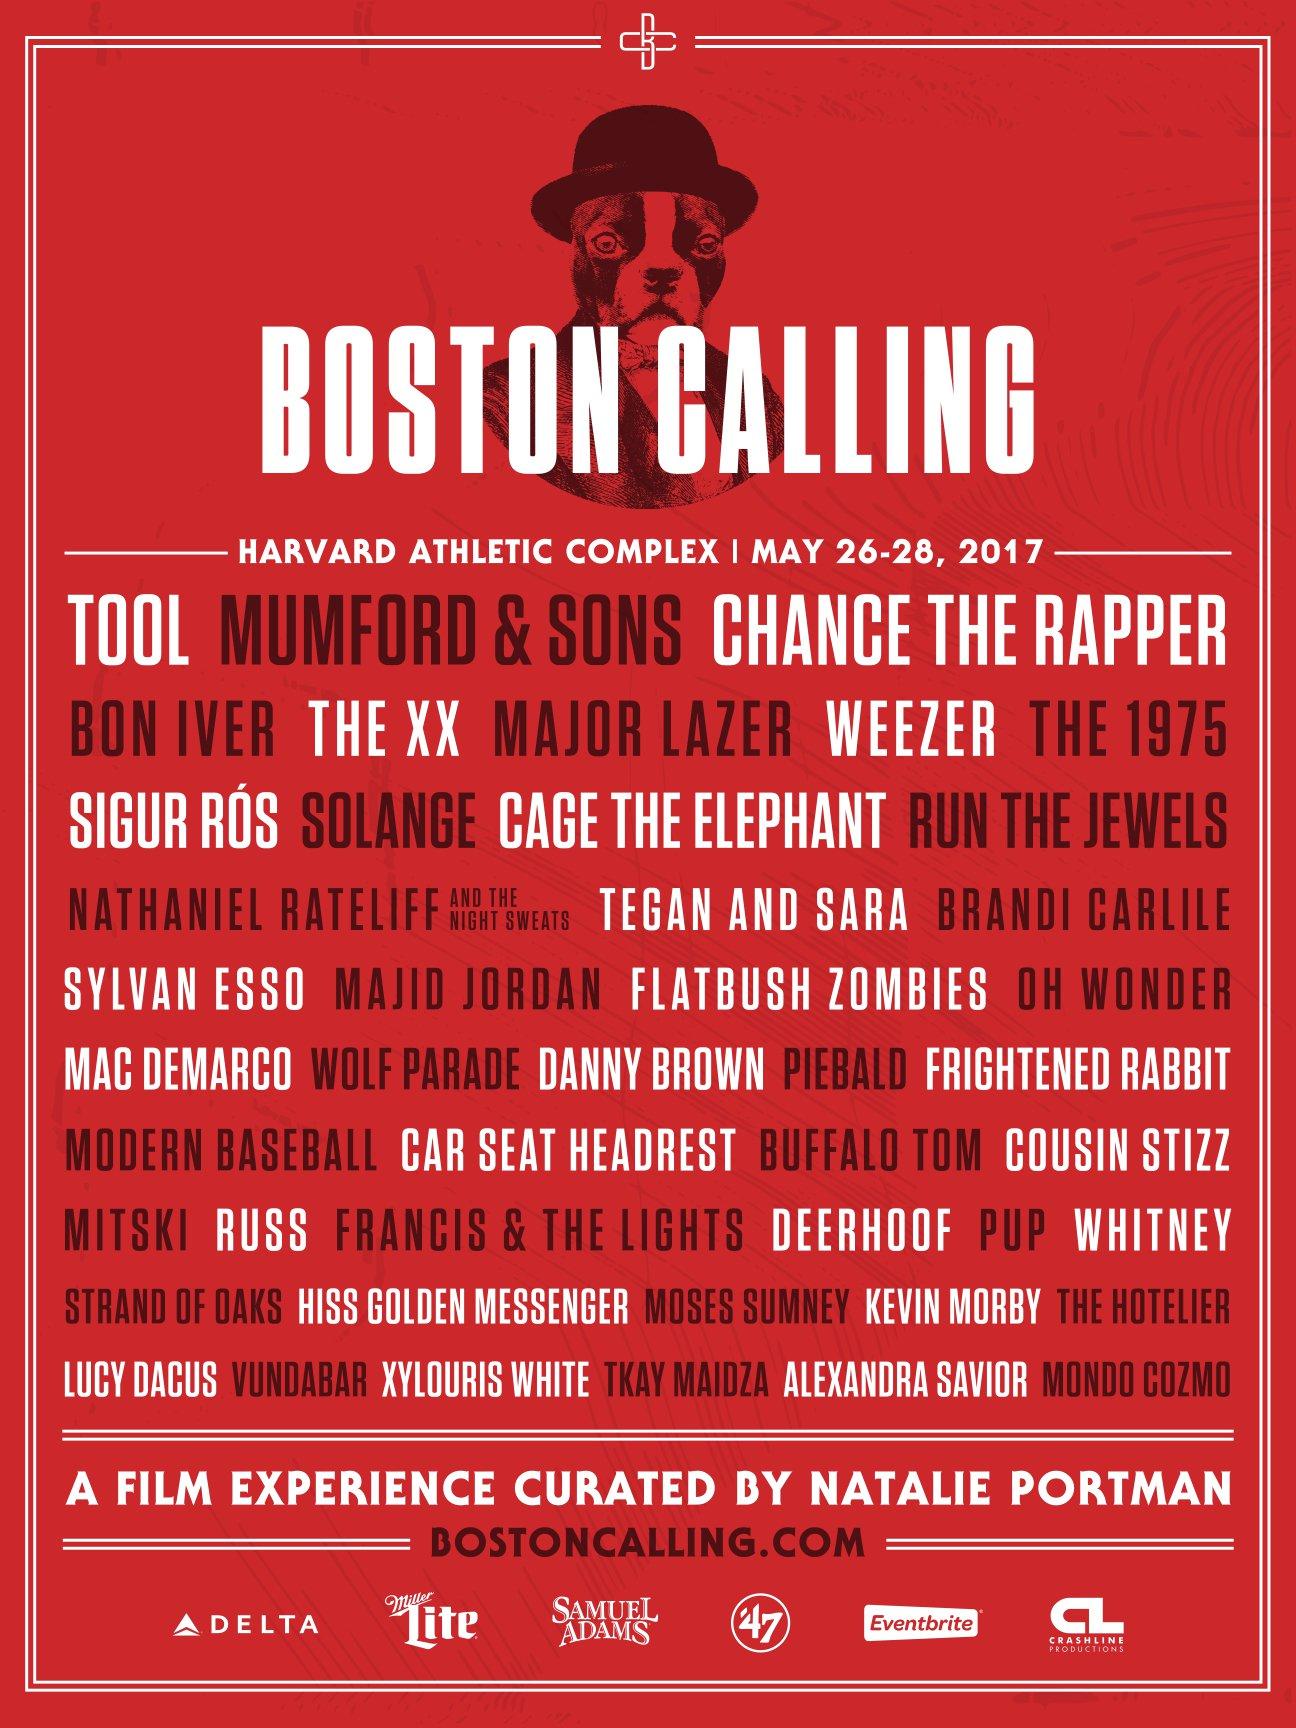 Boston Calling Announces 2017 Lineup